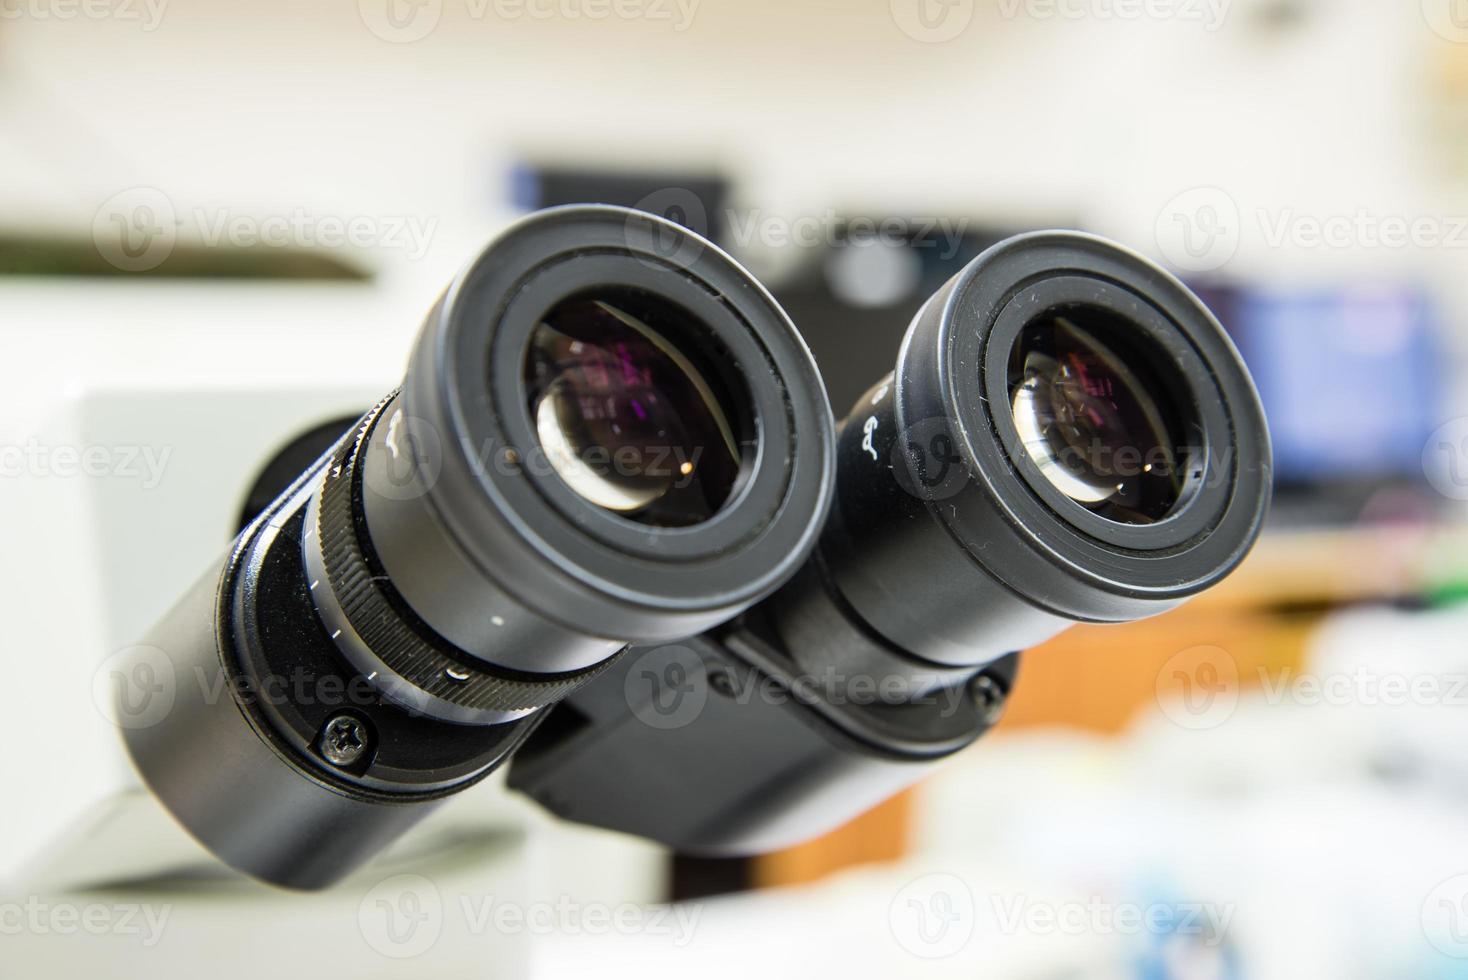 microscope oculaires agrandi. photo